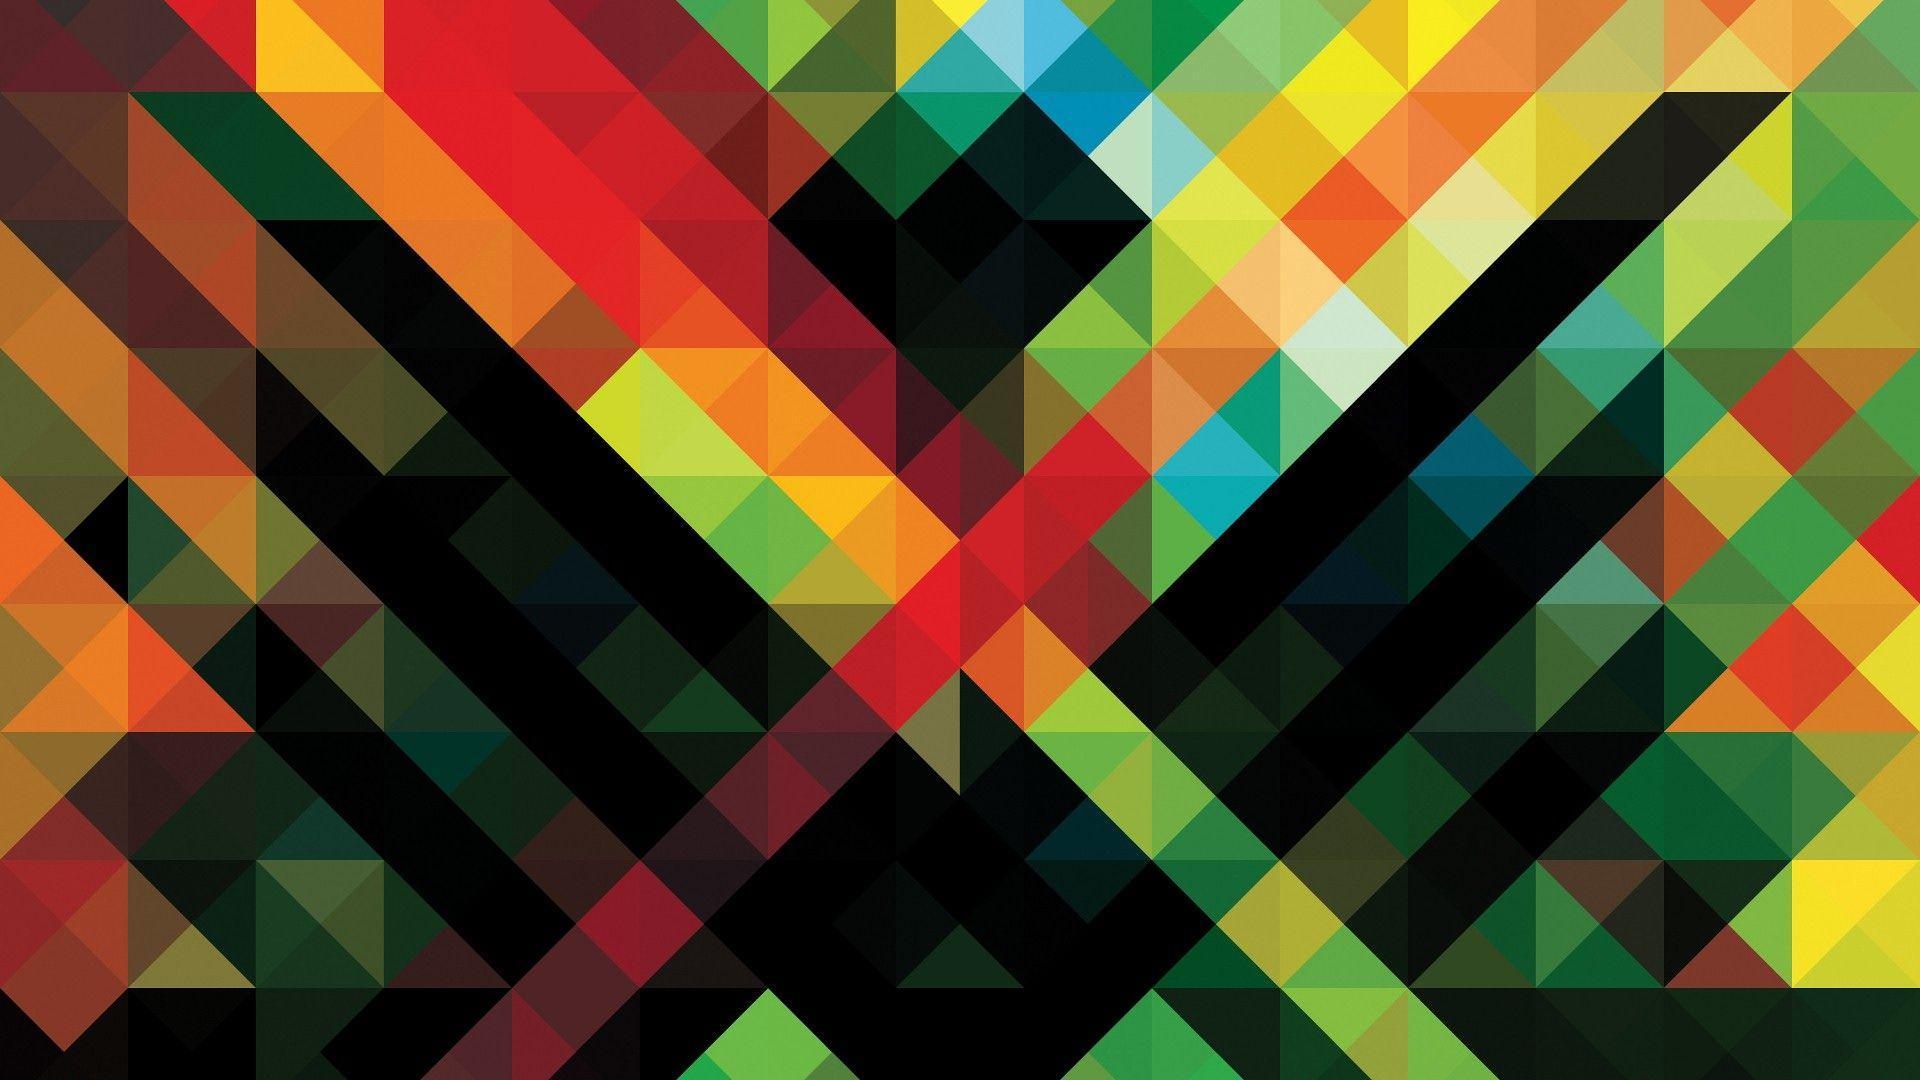 Abstract Geometric Wallpaper 184 1920x1080 - uMad.com